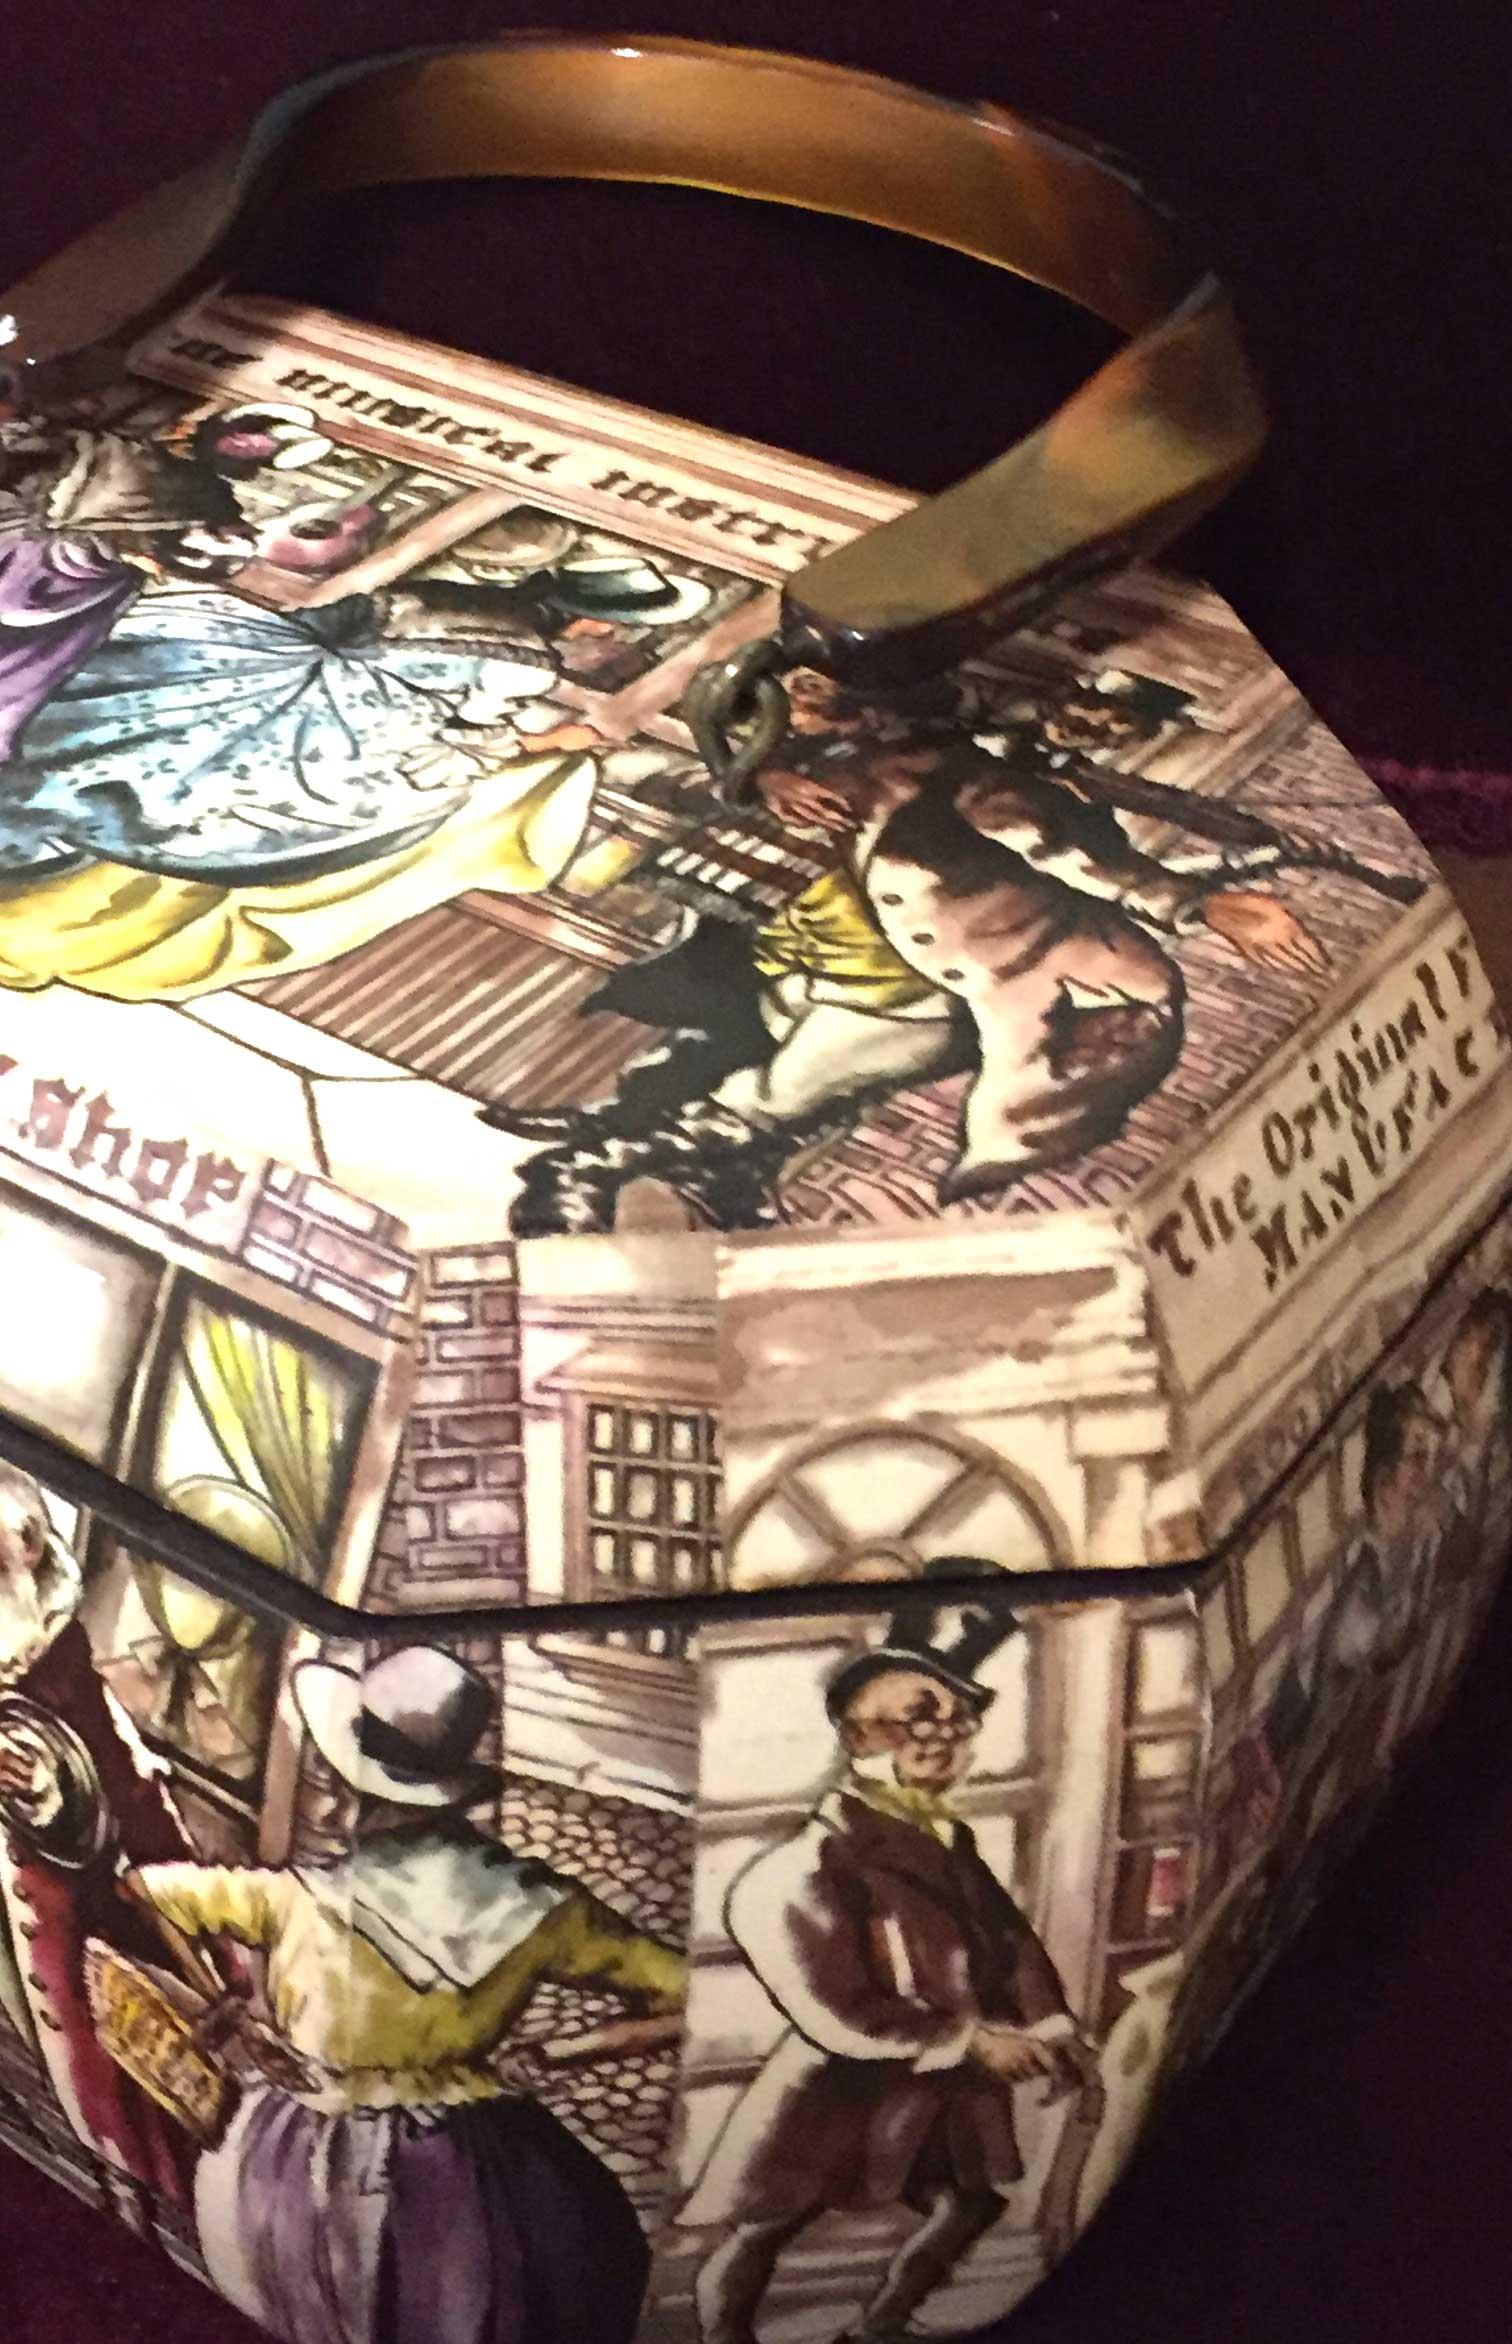 Vintage Handbag at the Spare Room